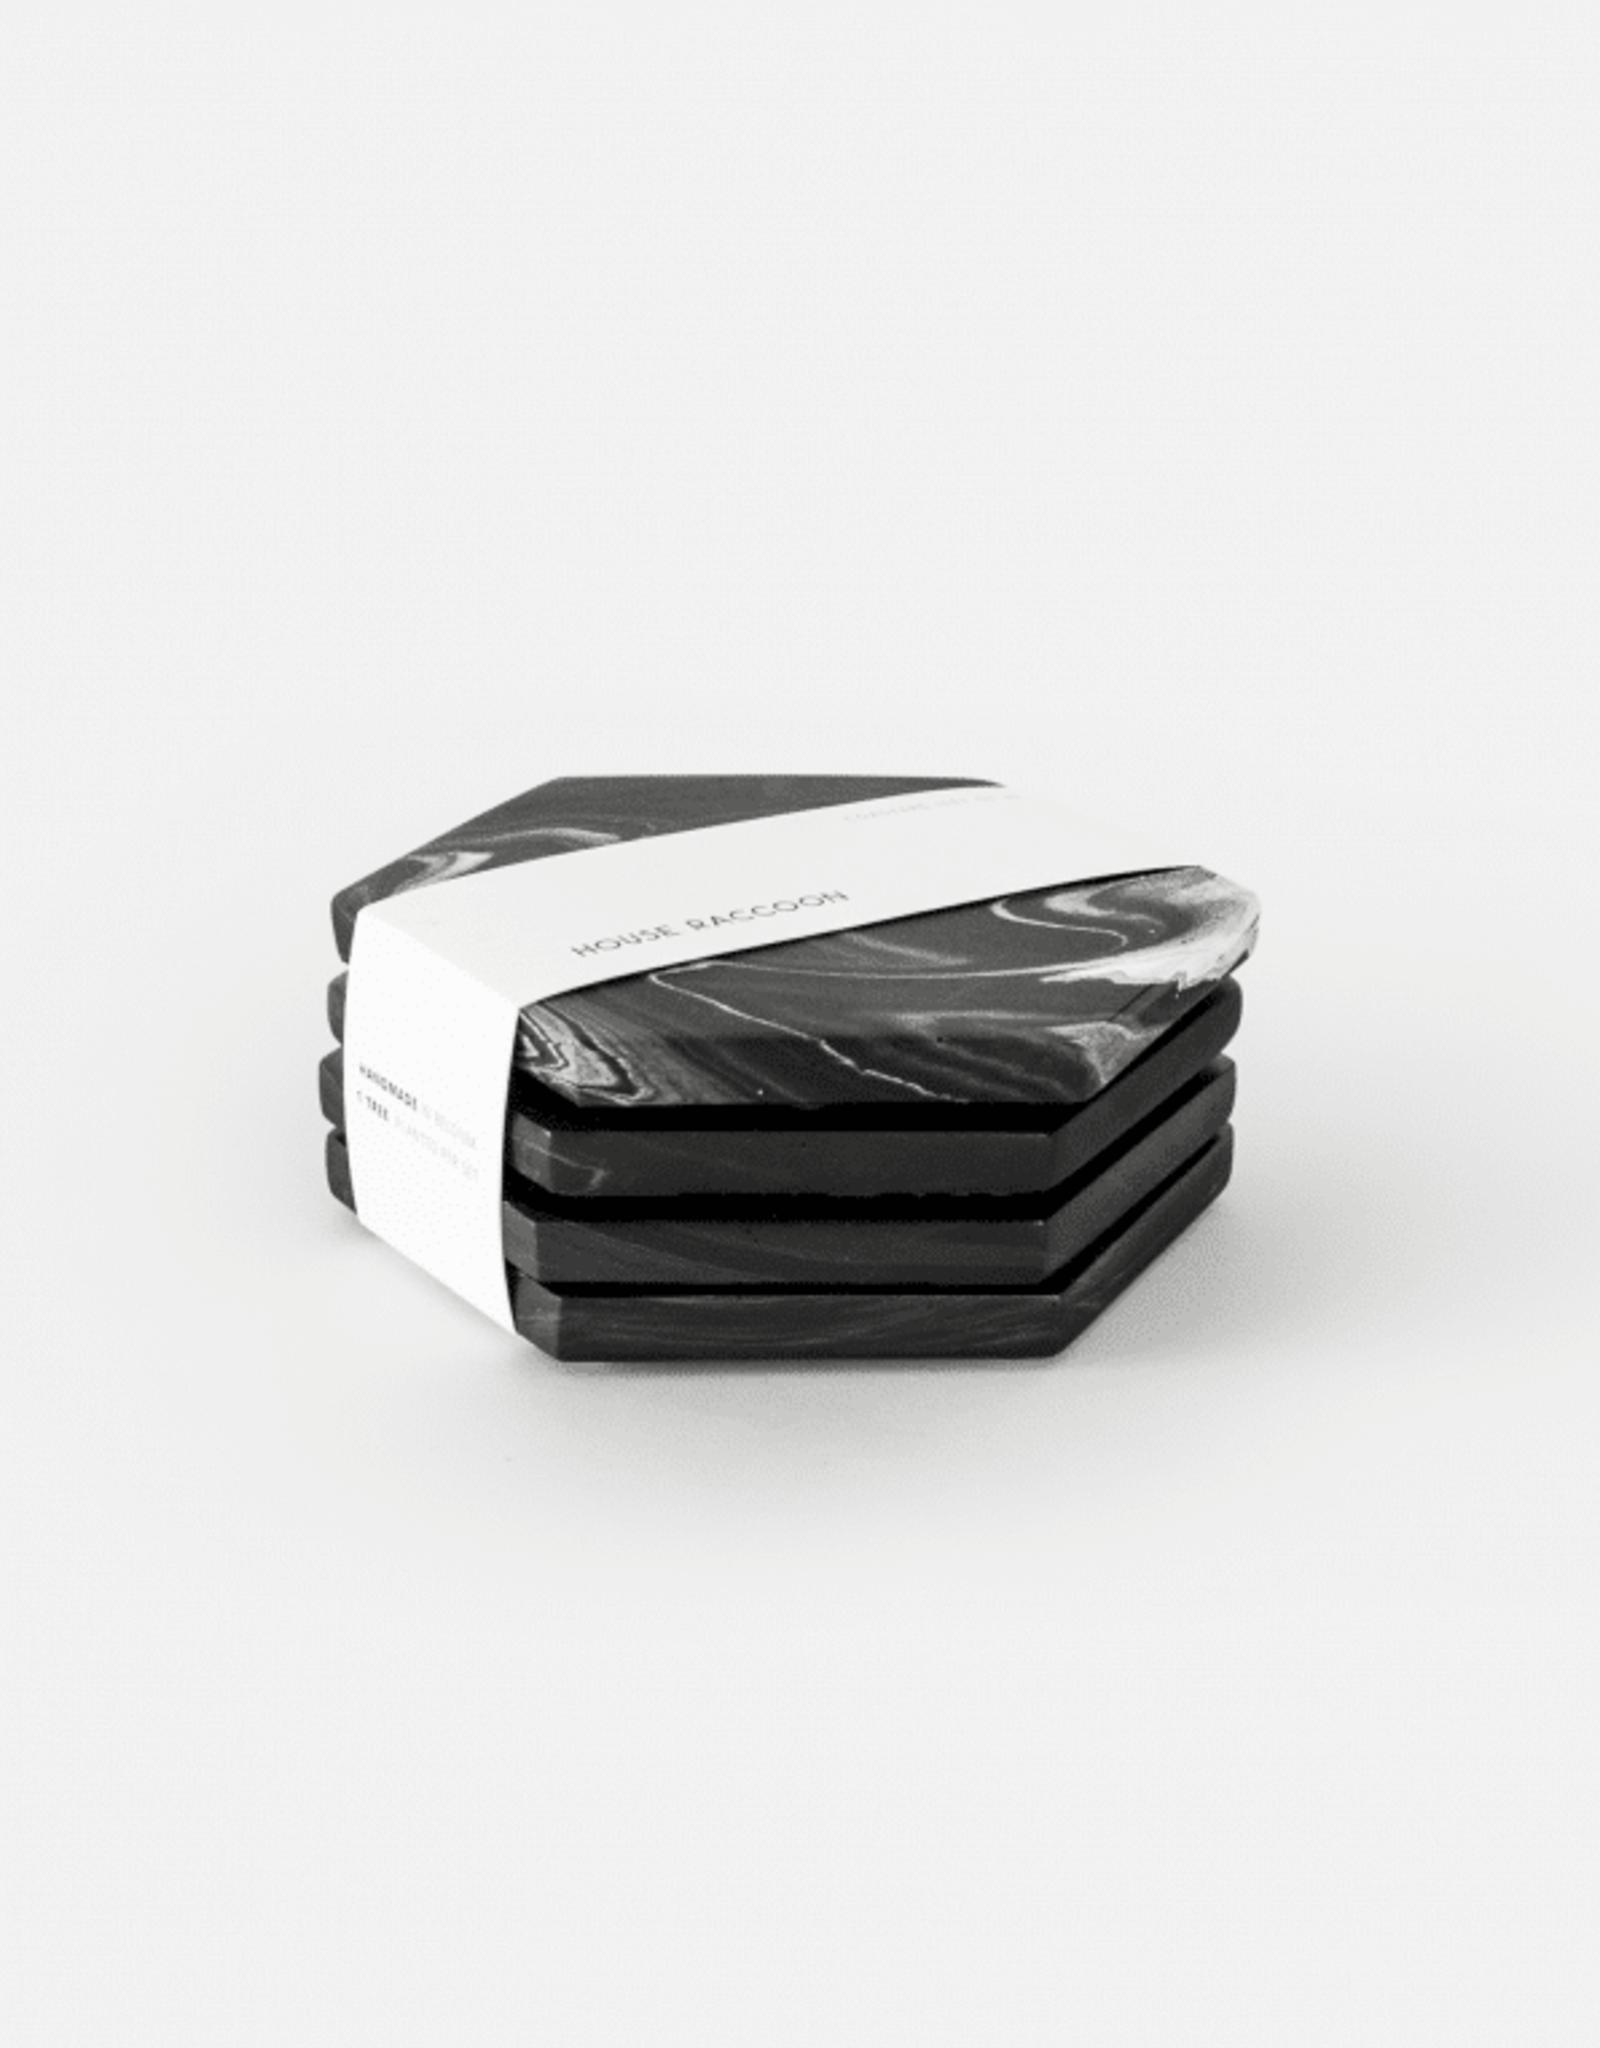 House Raccoon House Raccoon - Dalbane coasters - Black marble